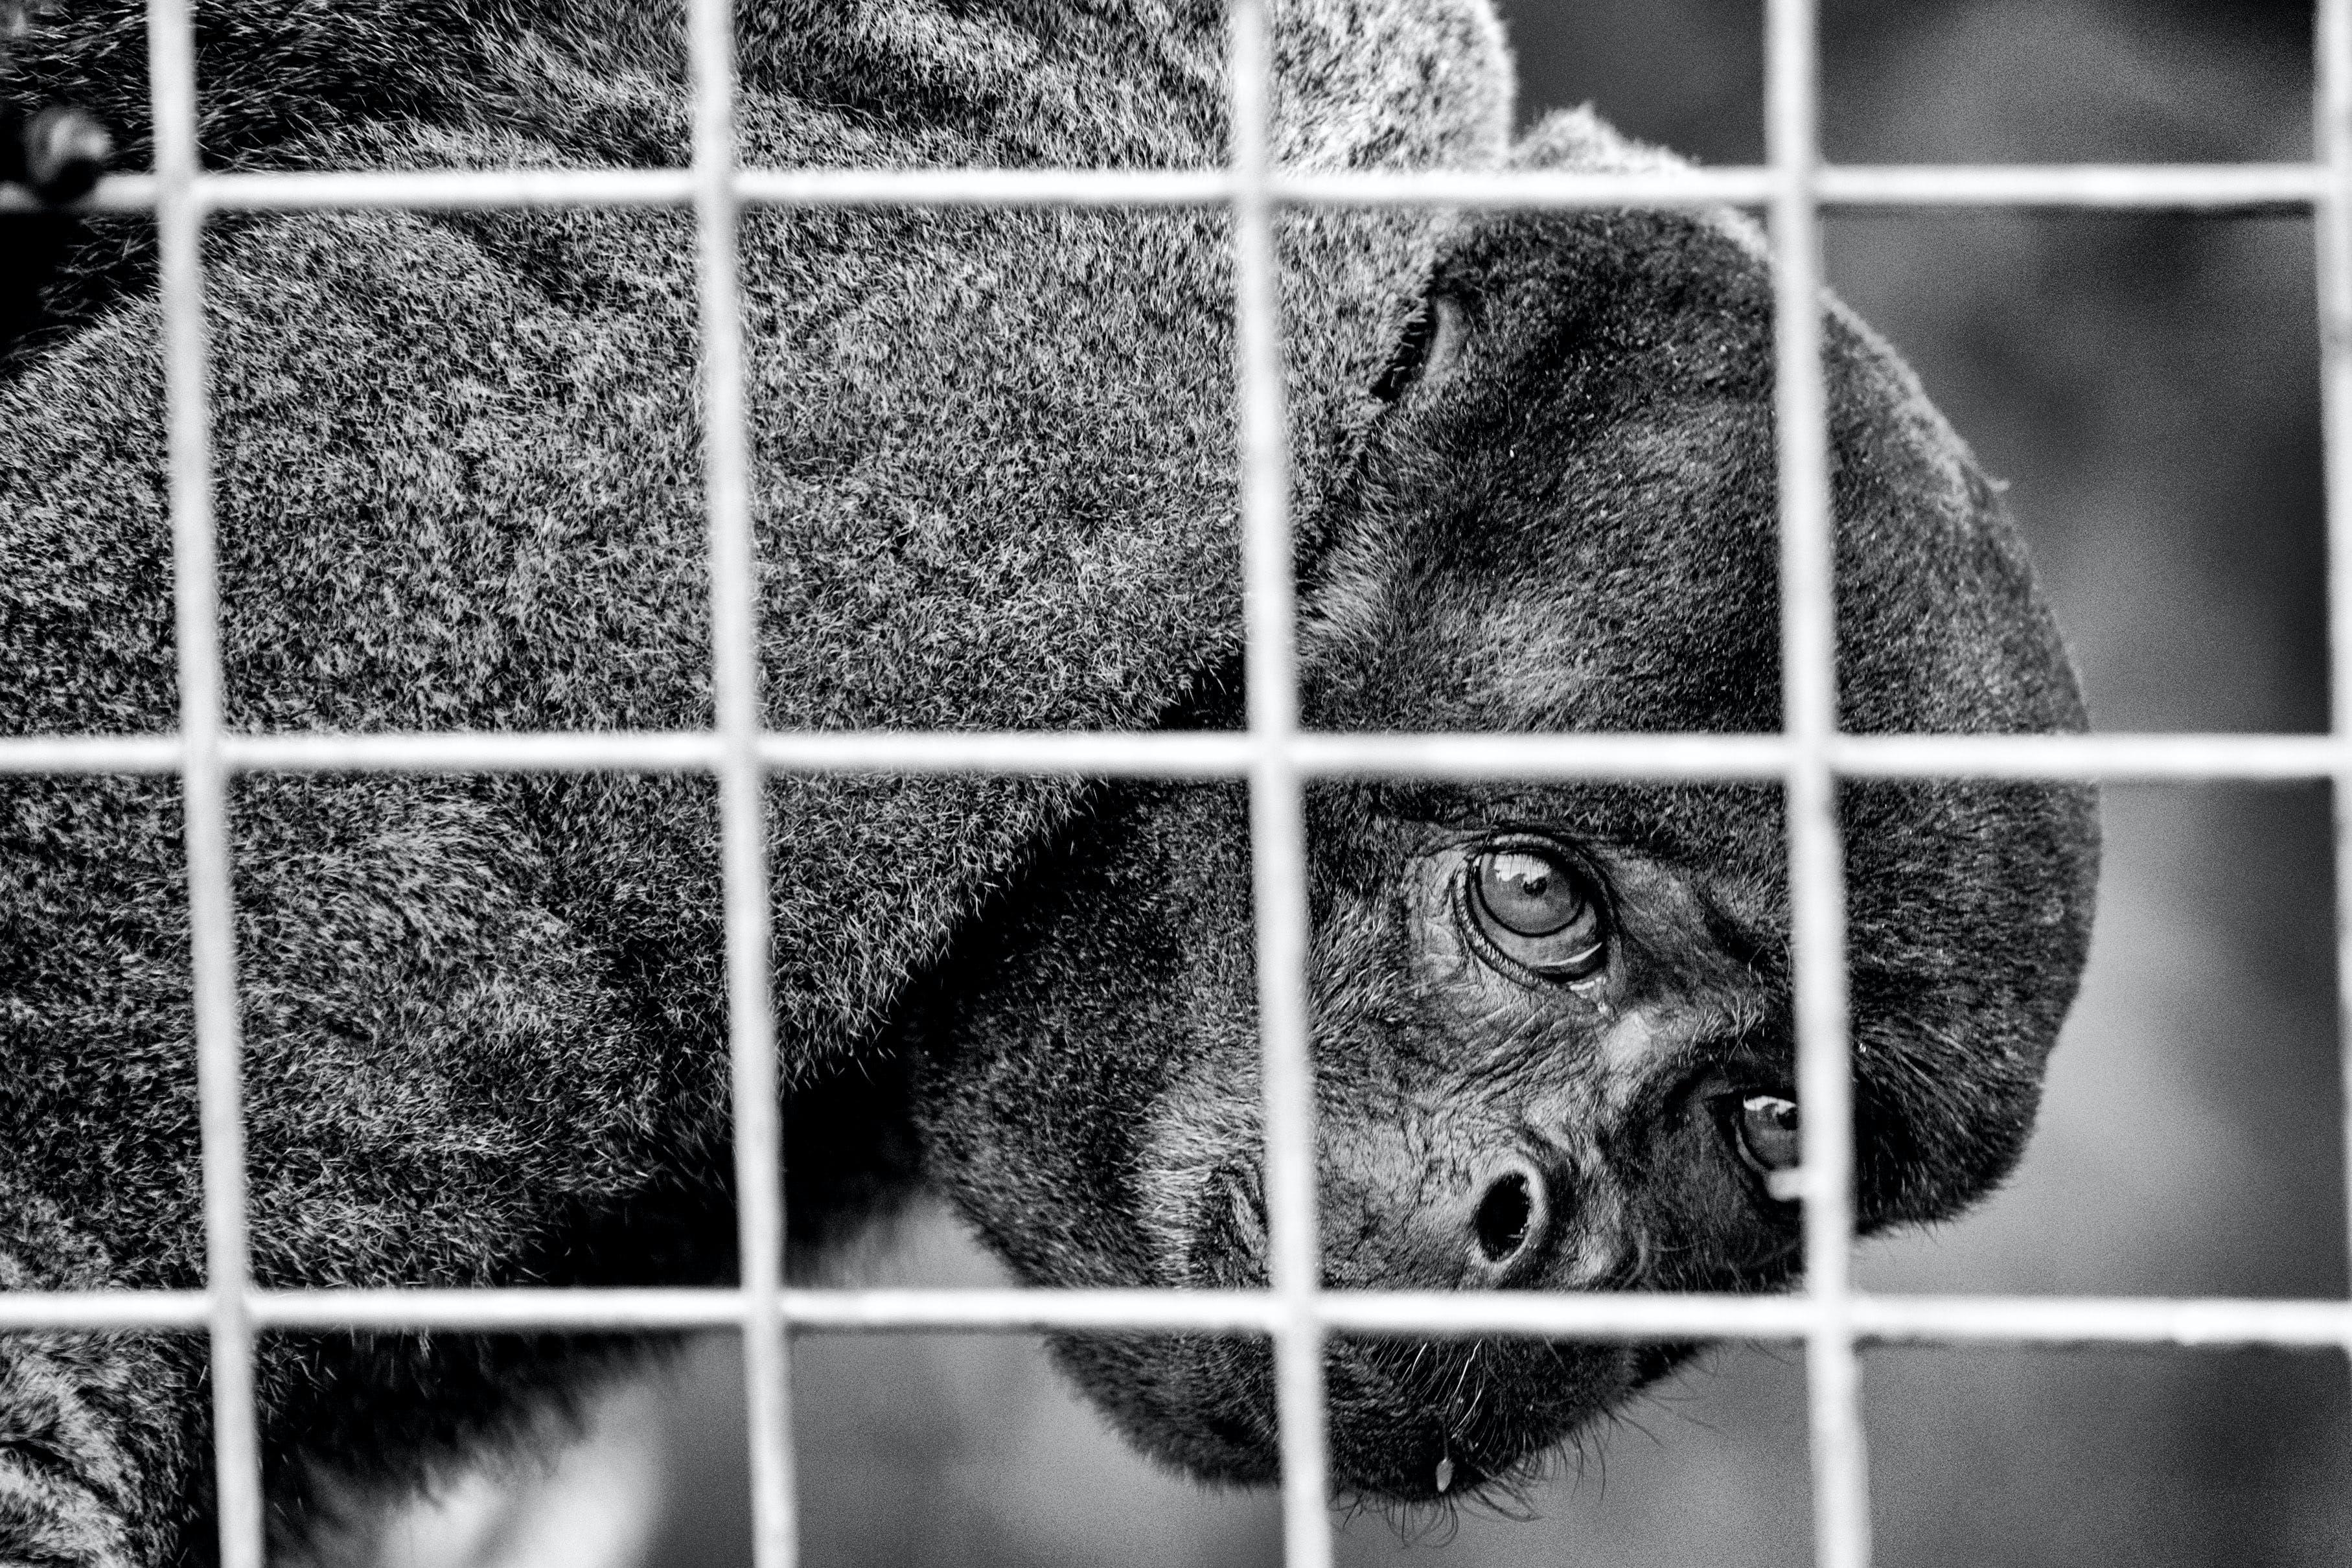 Grayscale Photo of Animal